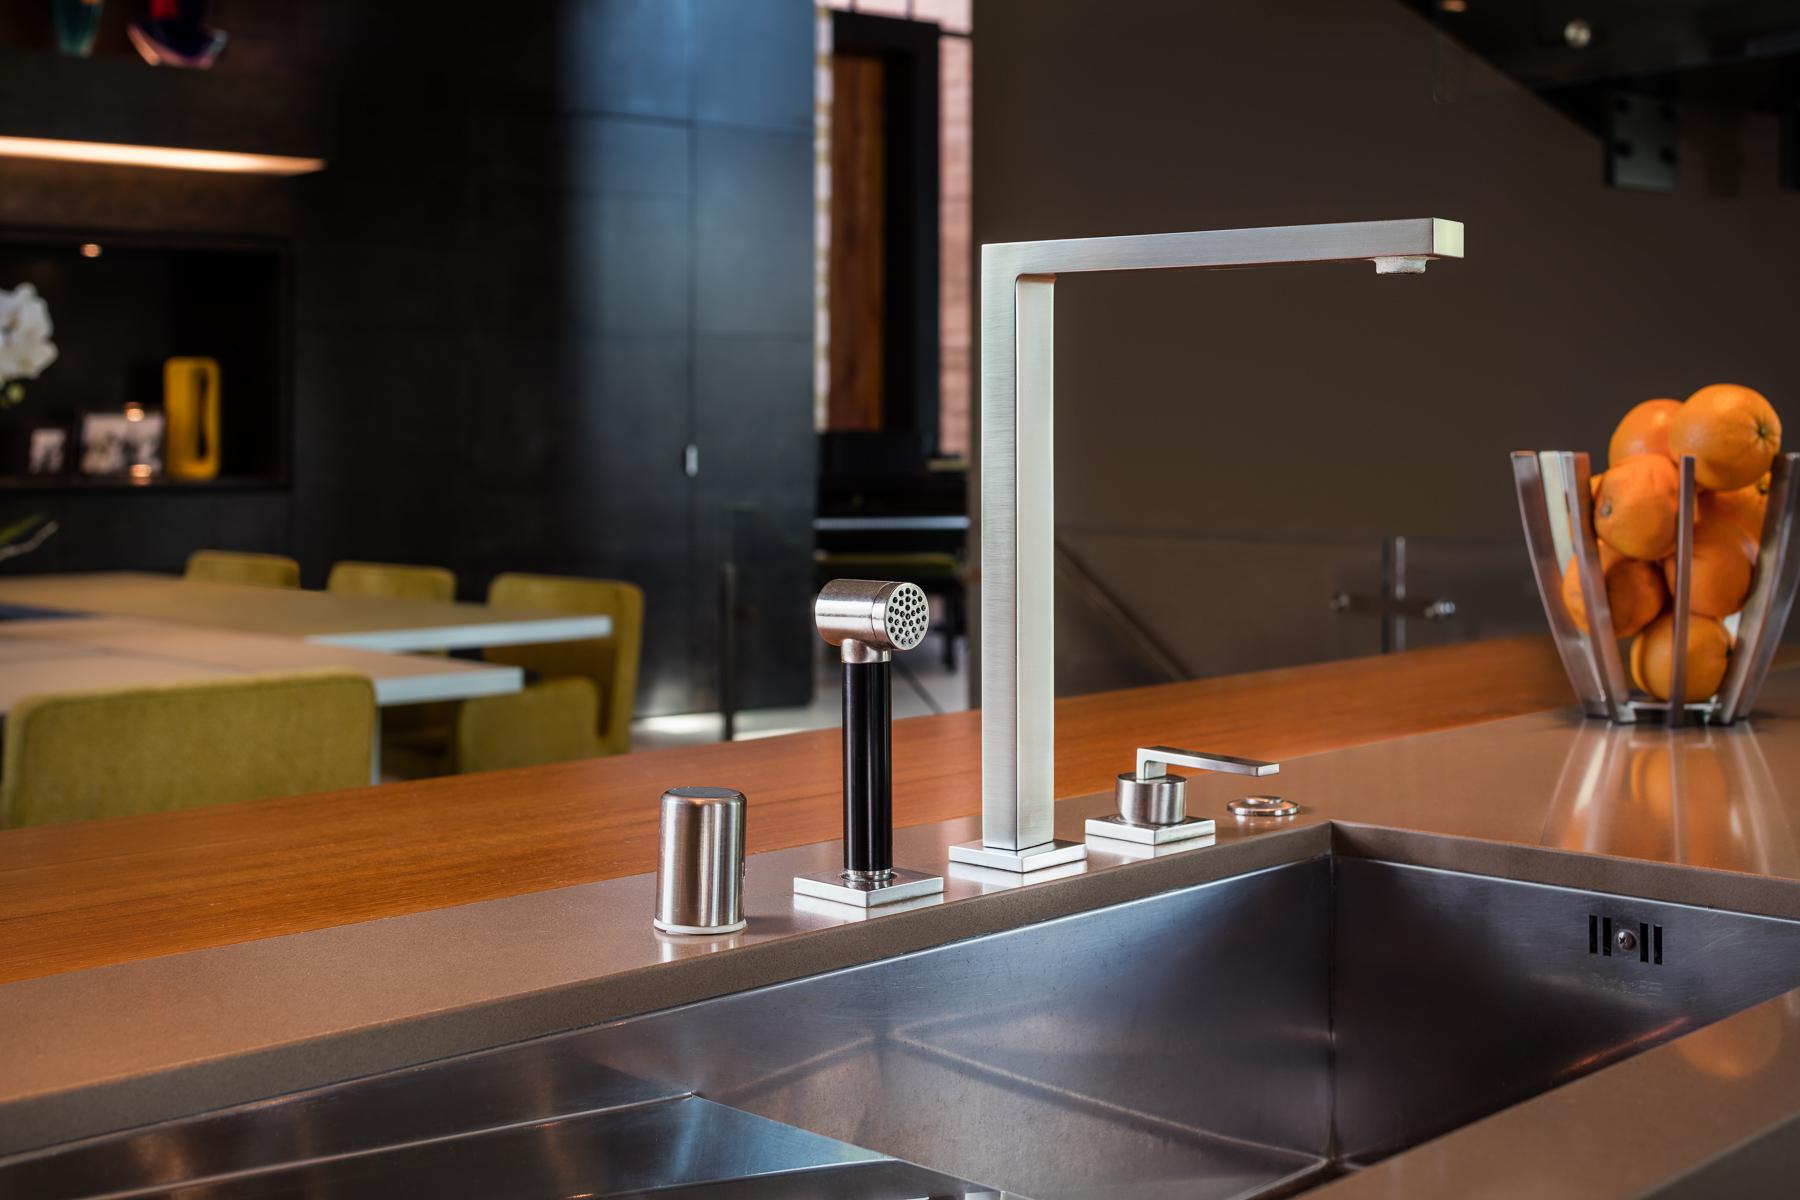 7 Sable Ridge Kitchen Sink Detail 1